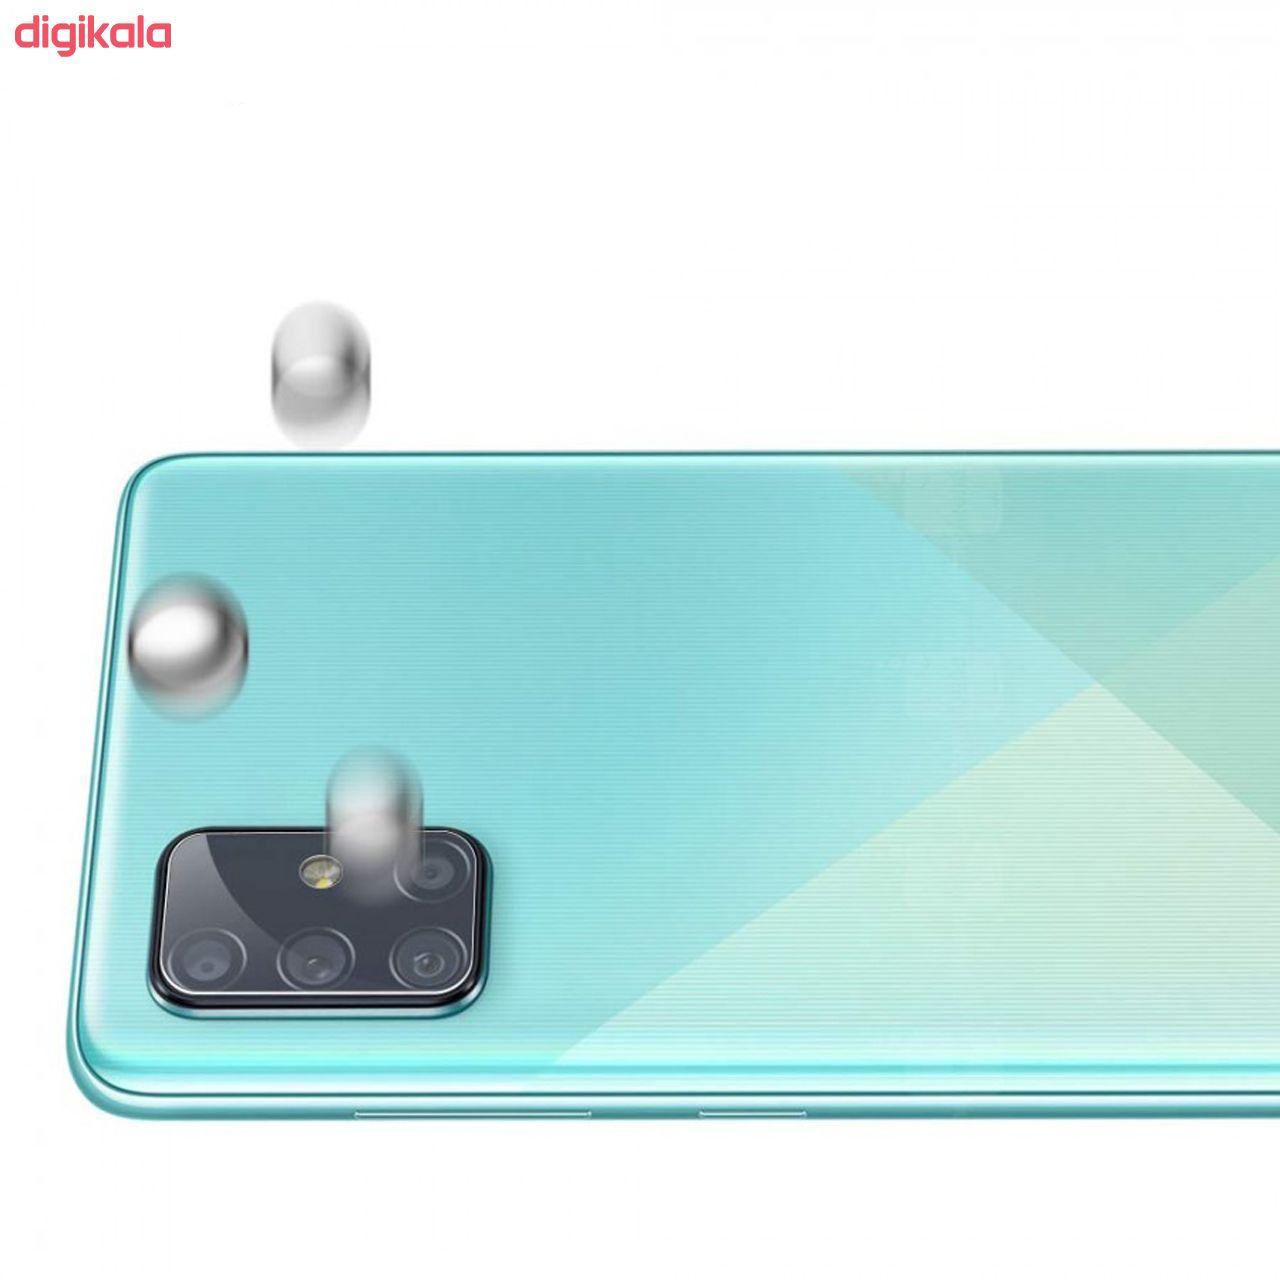 محافظ لنز دوربین سیحان مدل GLP مناسب برای گوشی موبایل سامسونگ Galaxy A71 main 1 1